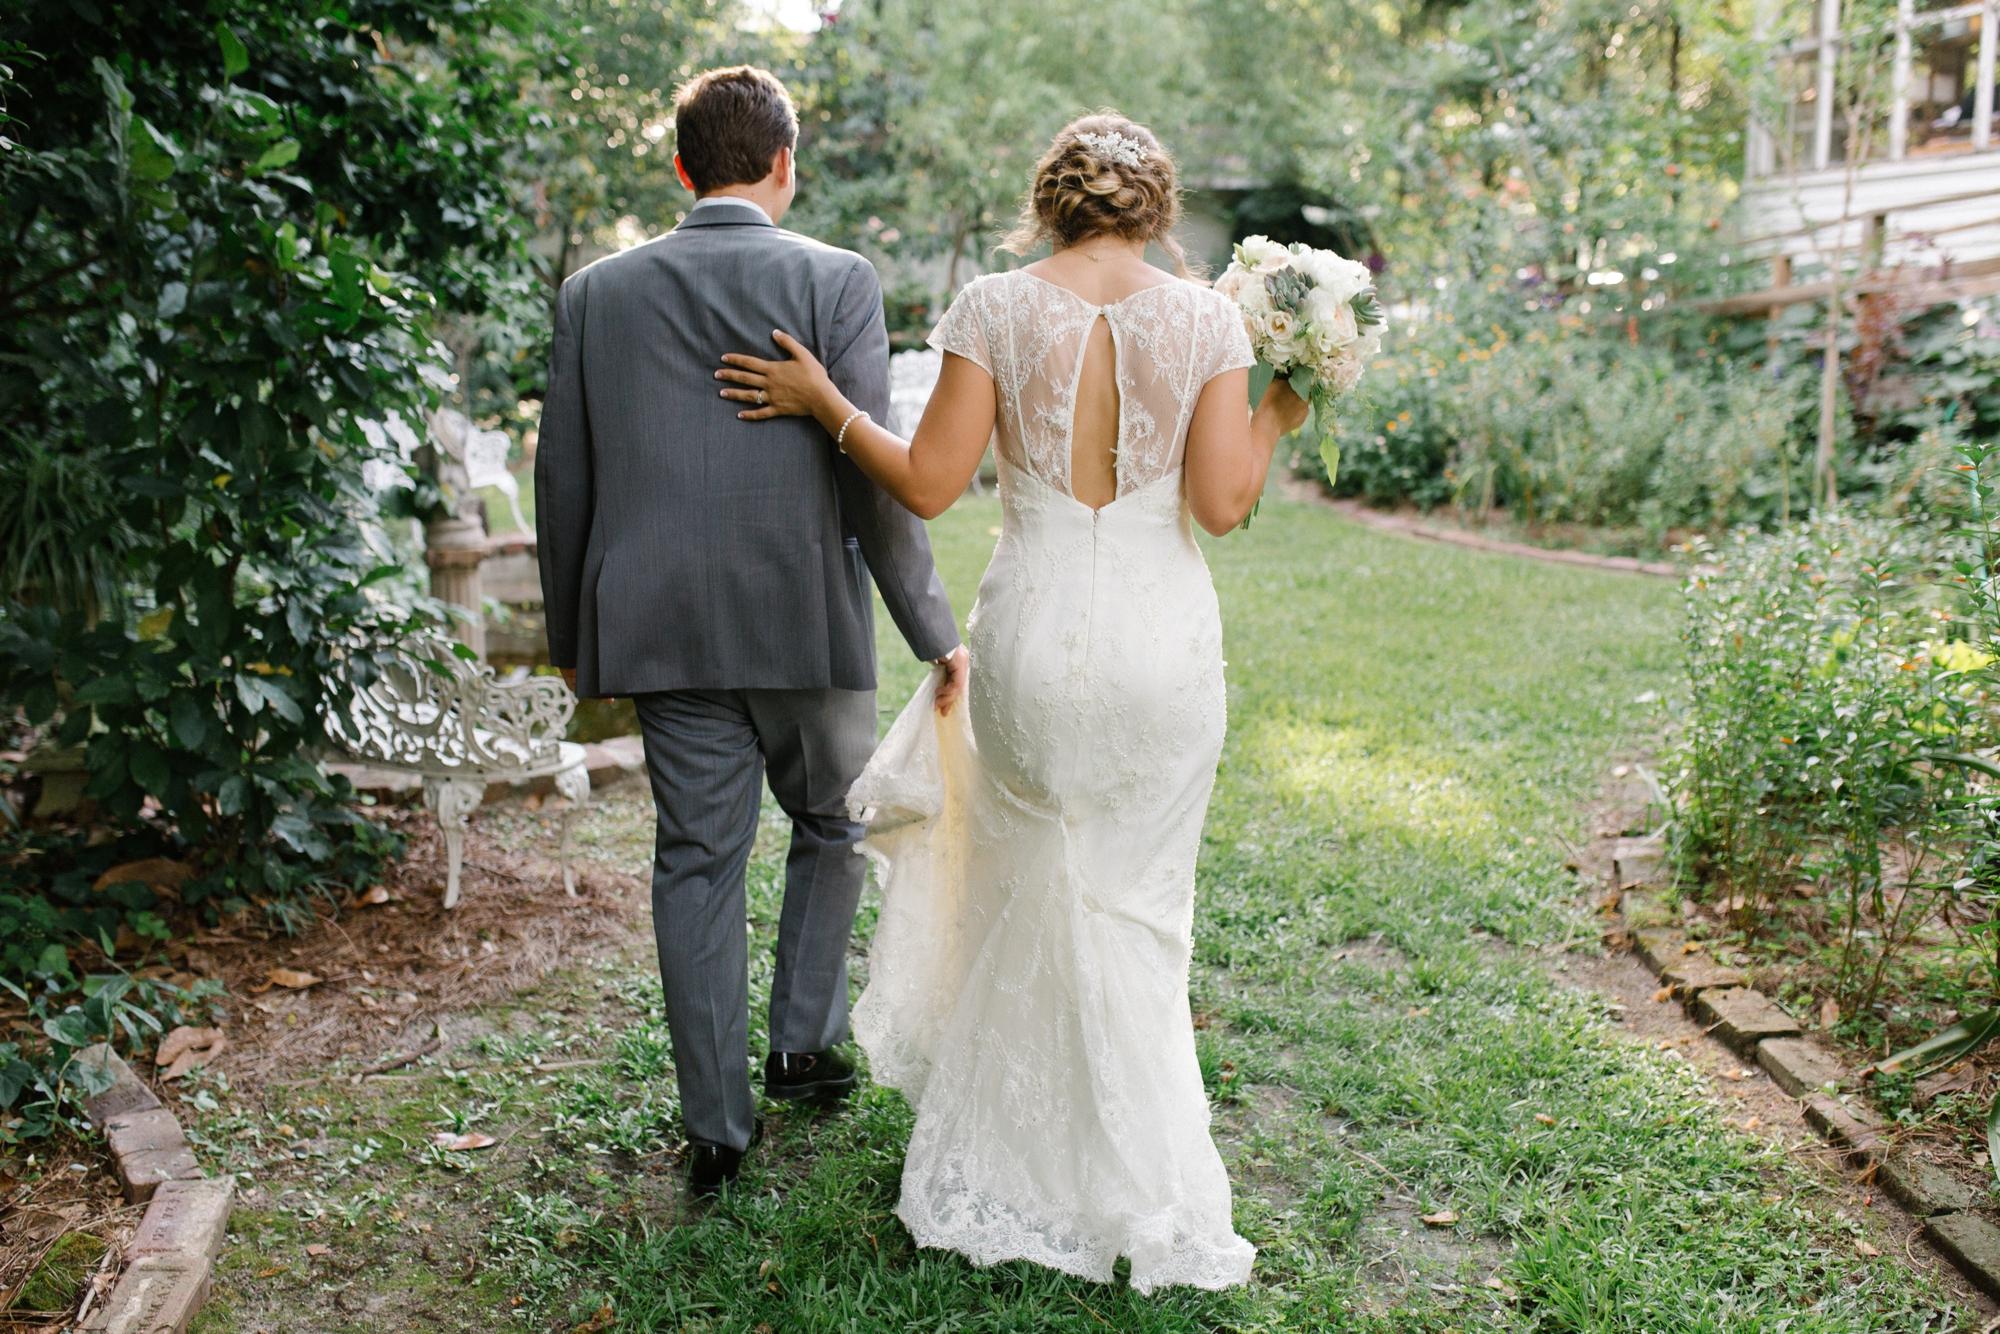 New_Orleans_Wedding_Photographer_1651.jpg